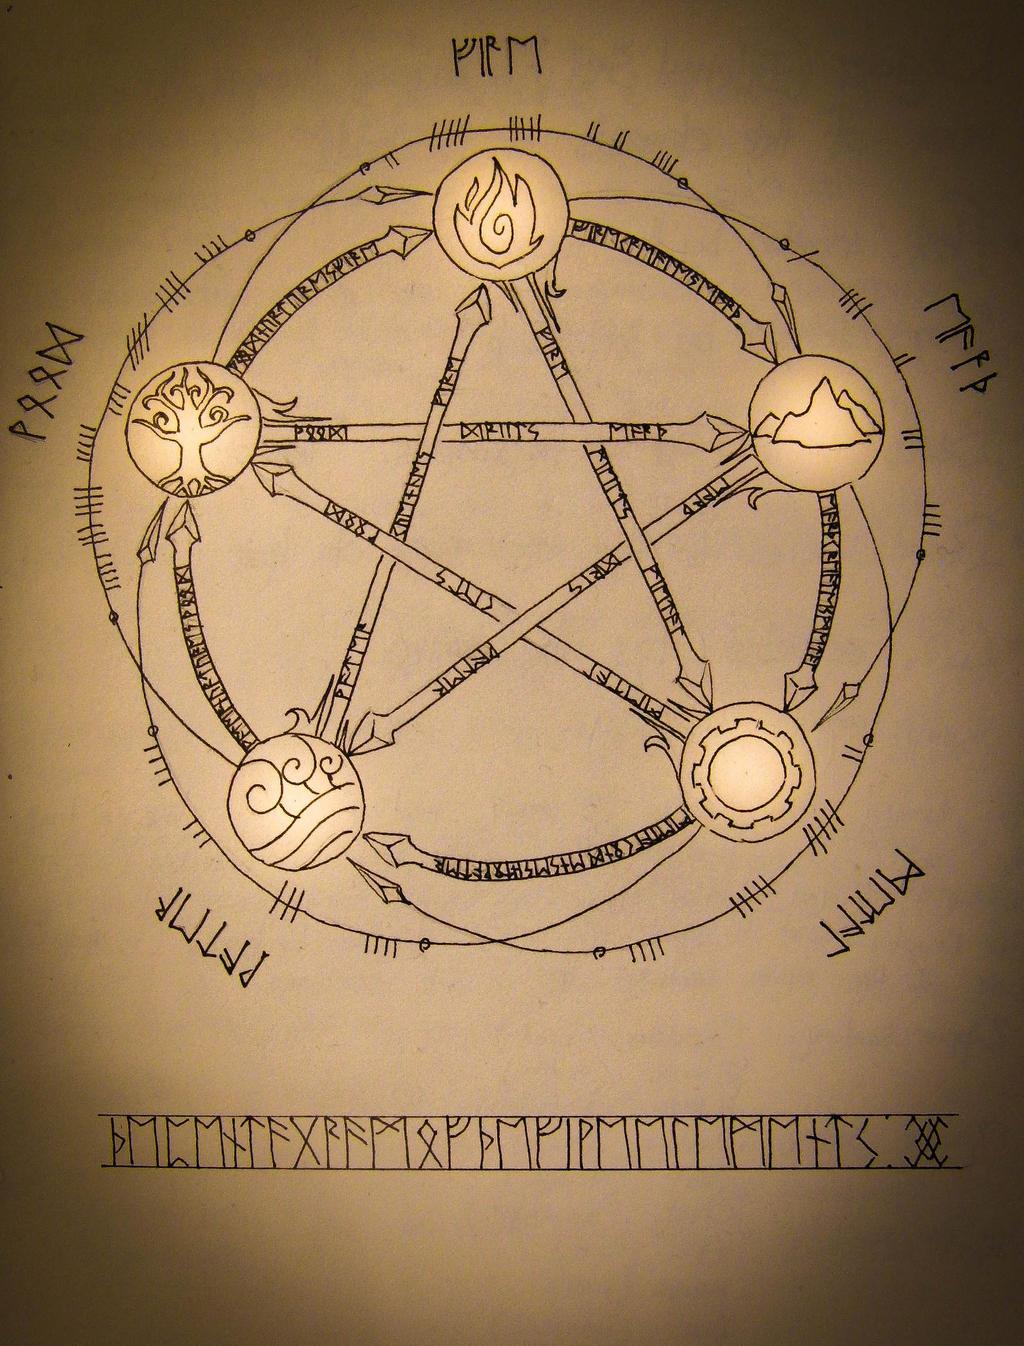 pentagram five elements by nirnaethenainur on deviantart